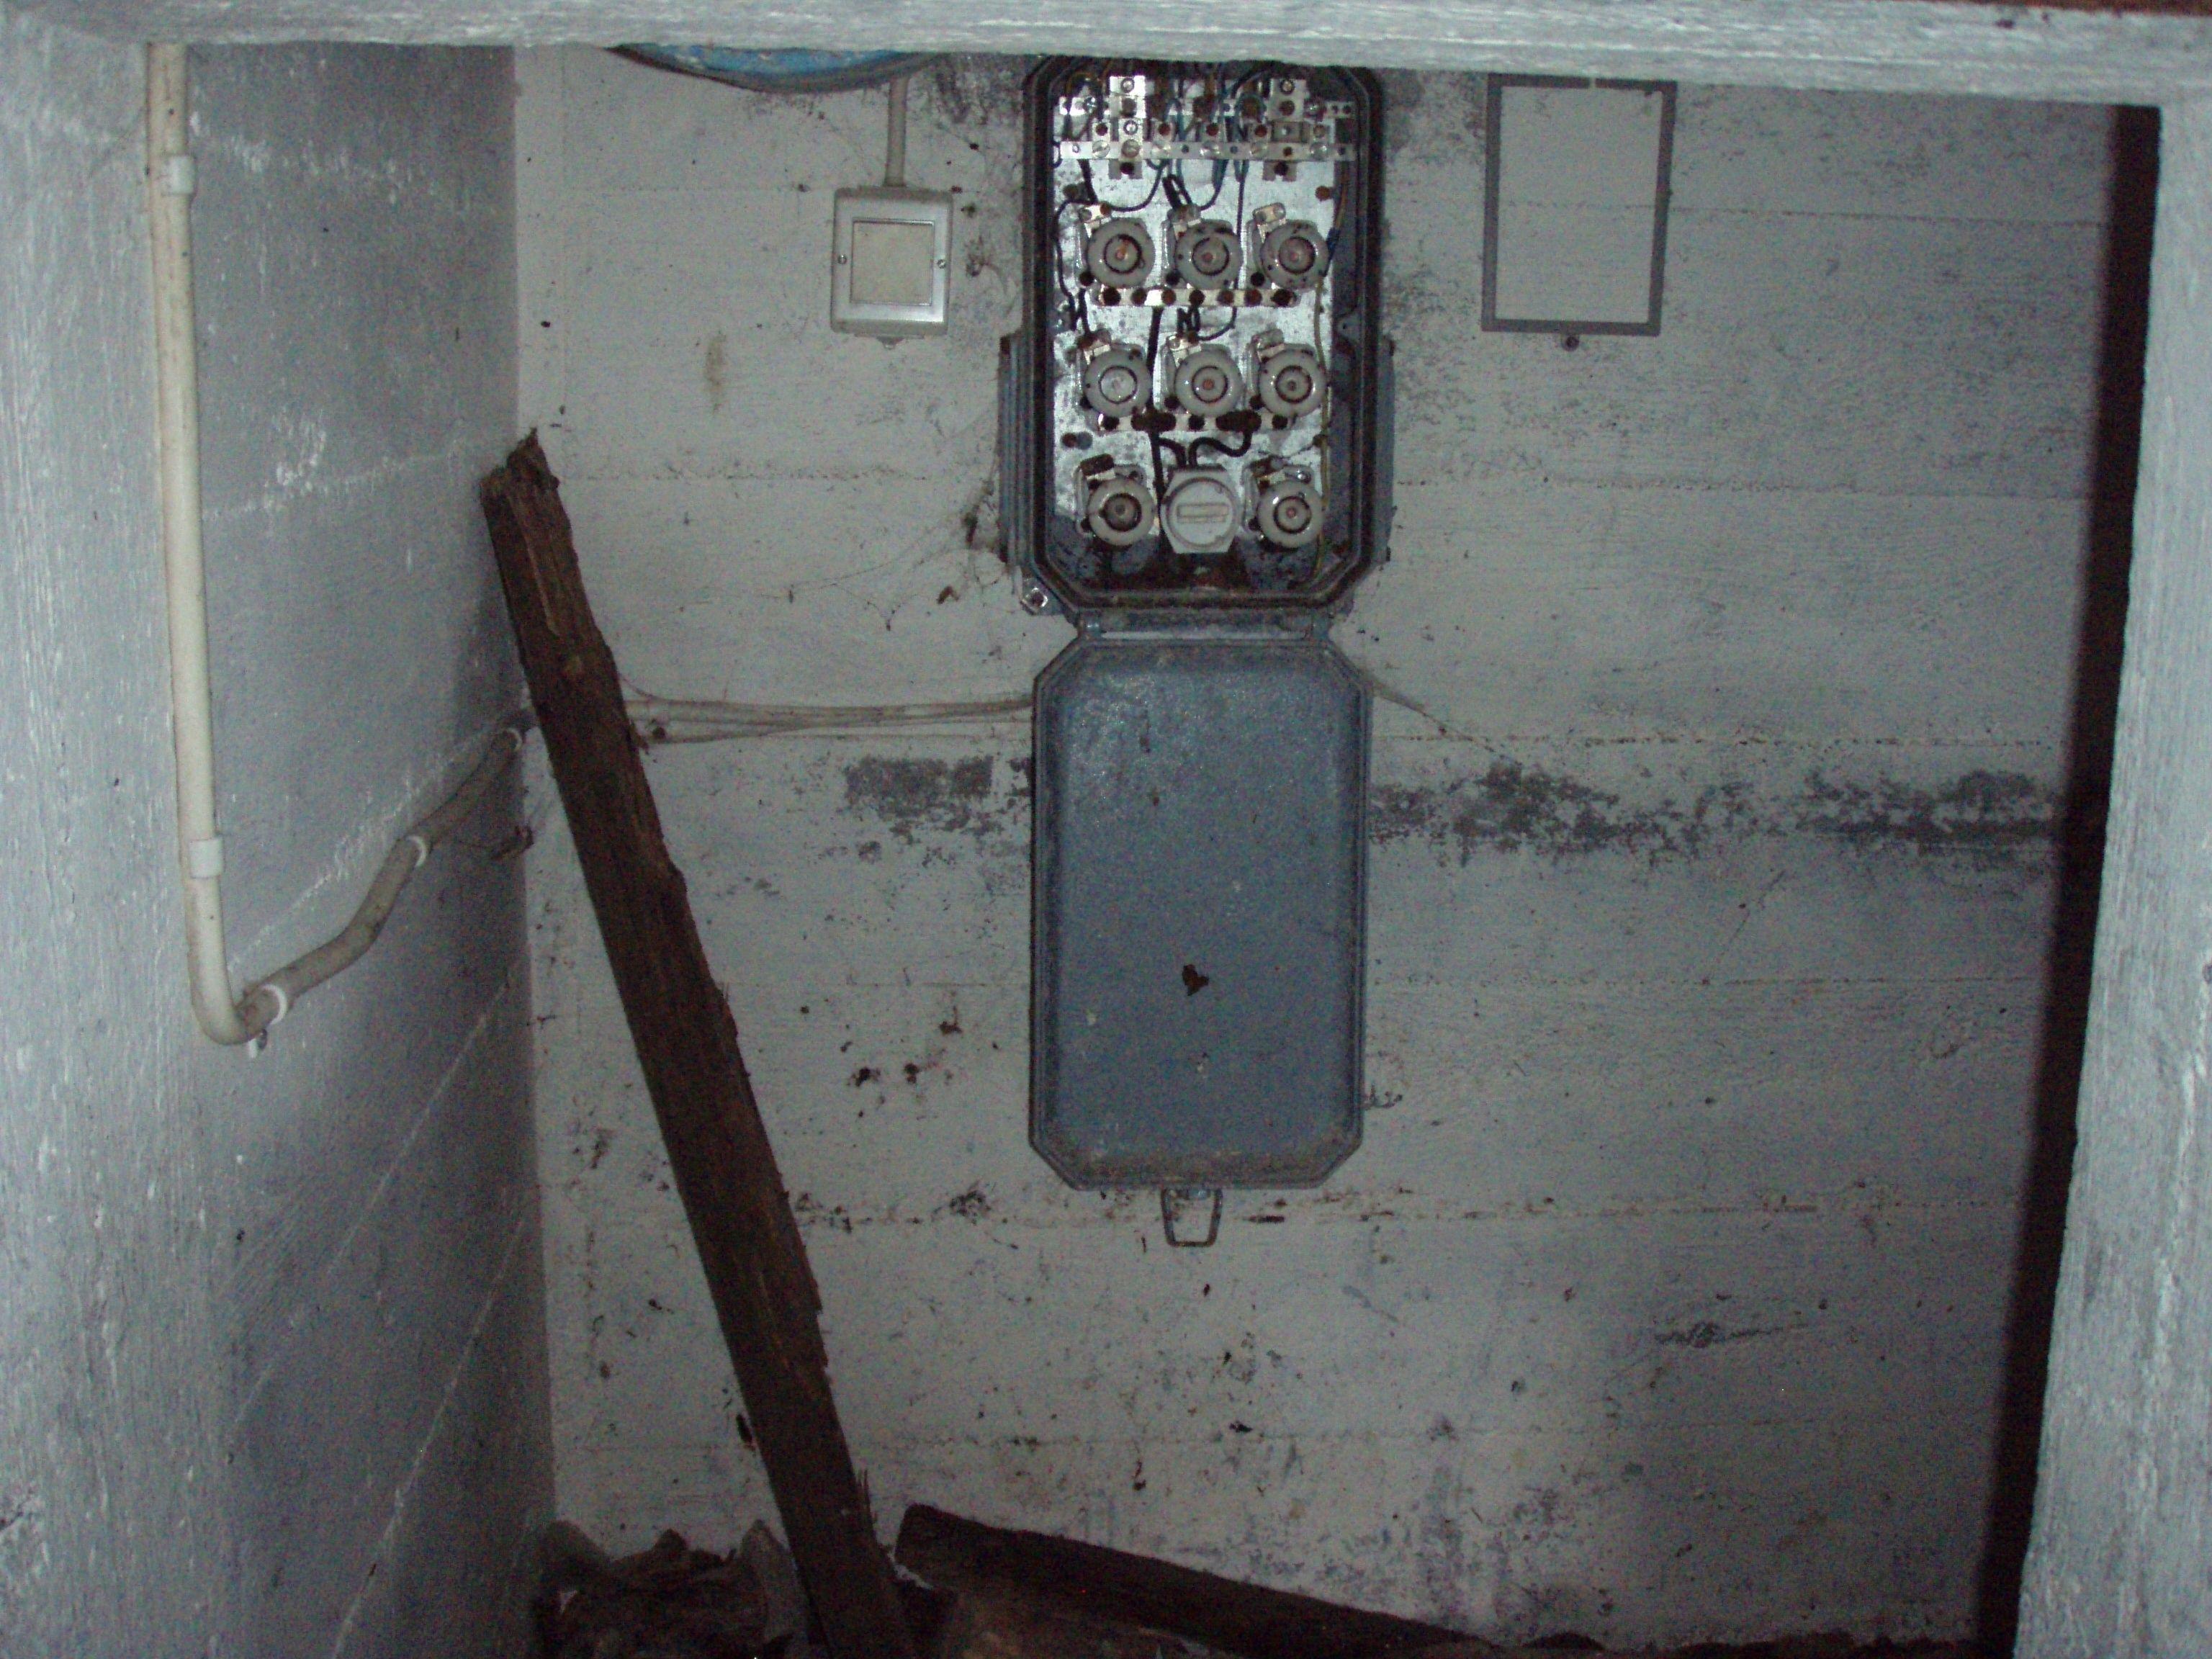 hight resolution of fuse box door handle wiring diagram fuse box door handle